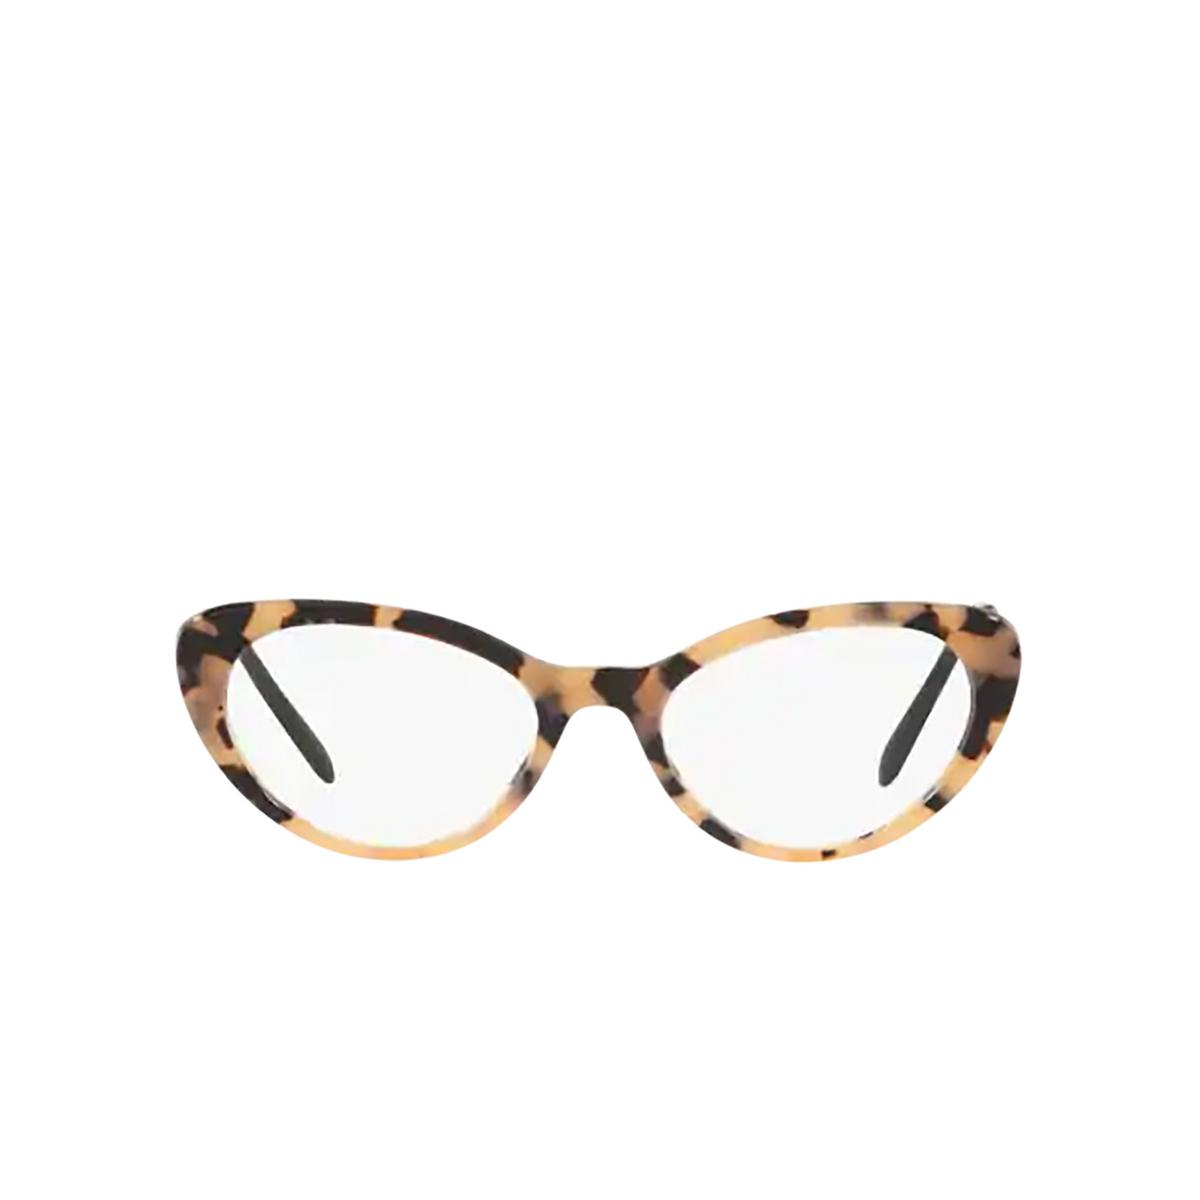 Miu Miu® Cat-eye Eyeglasses: MU 05RV color Pink Havana 07D1O1 - front view.